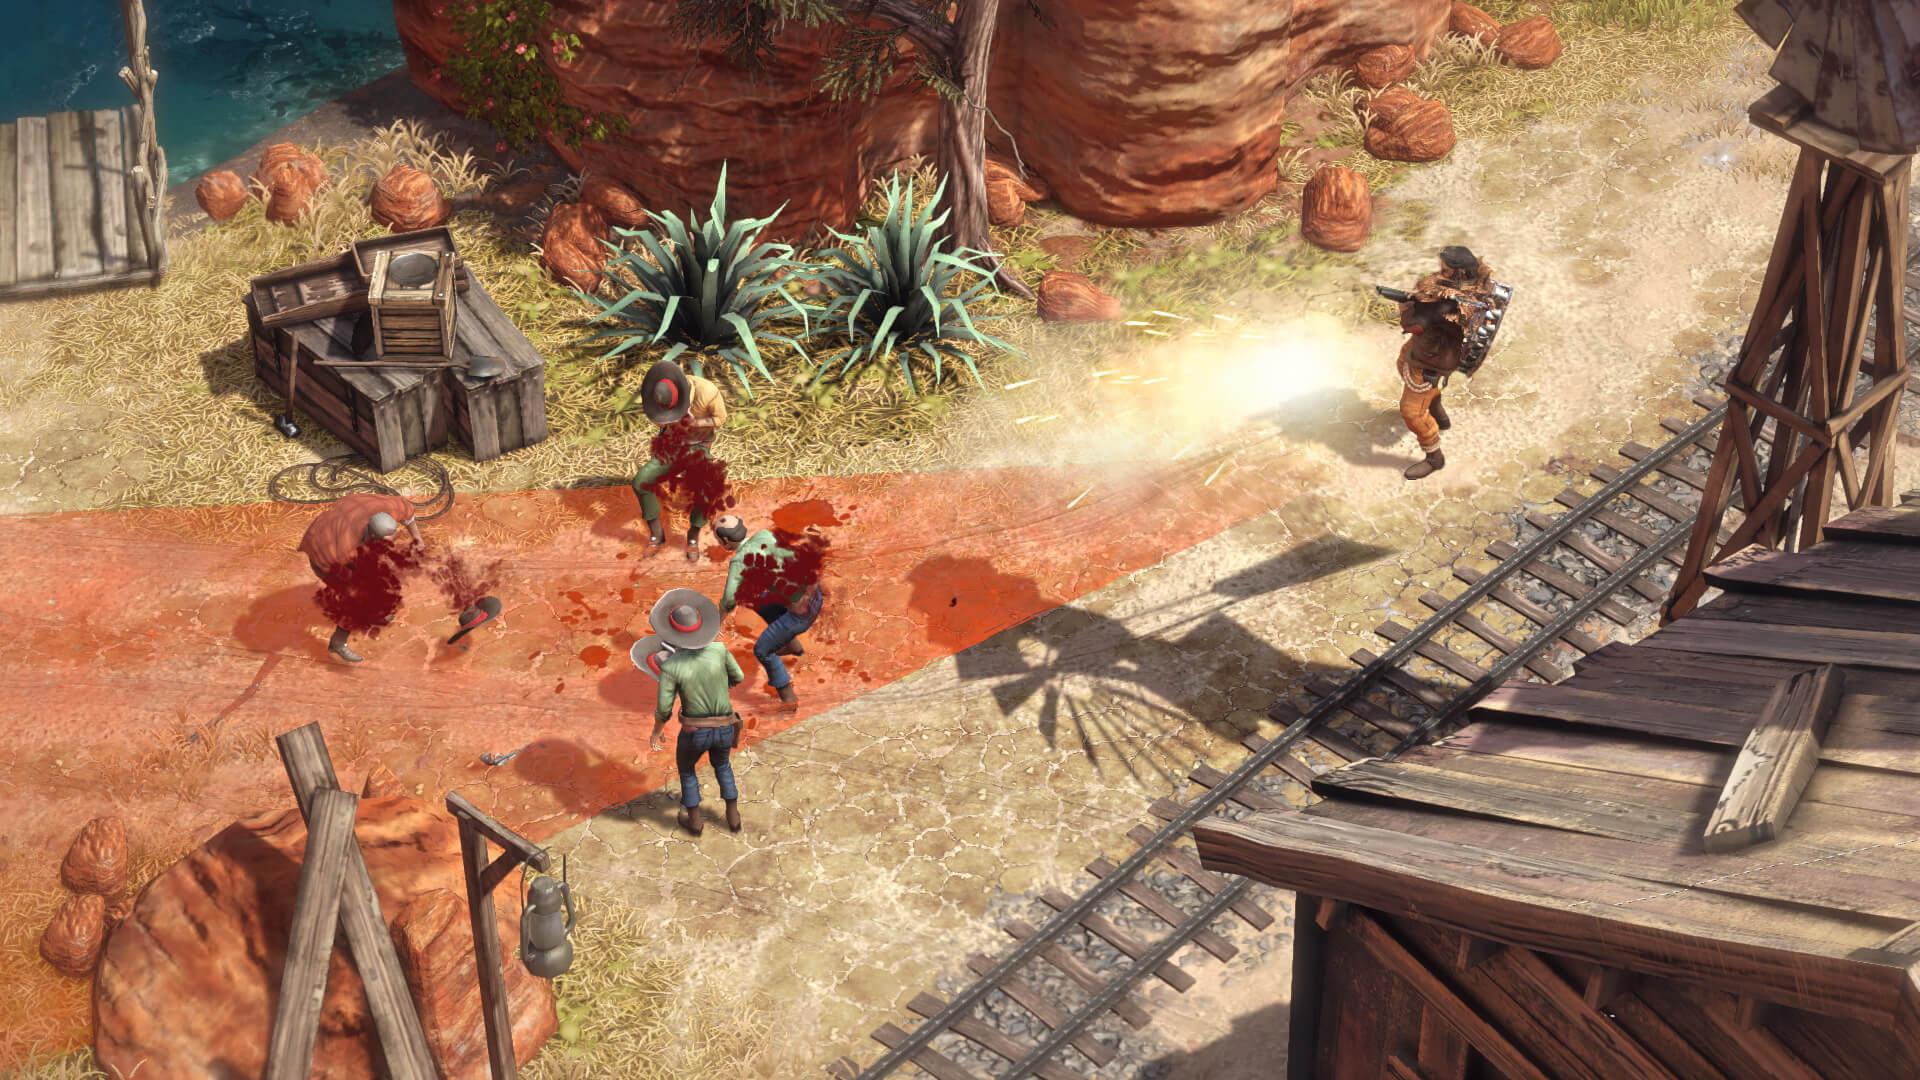 Desperados 3 Desperados Iii Is A Story Driven Hardcore Tactical Stealth Game Set In A Ruthless Wild West Scenario